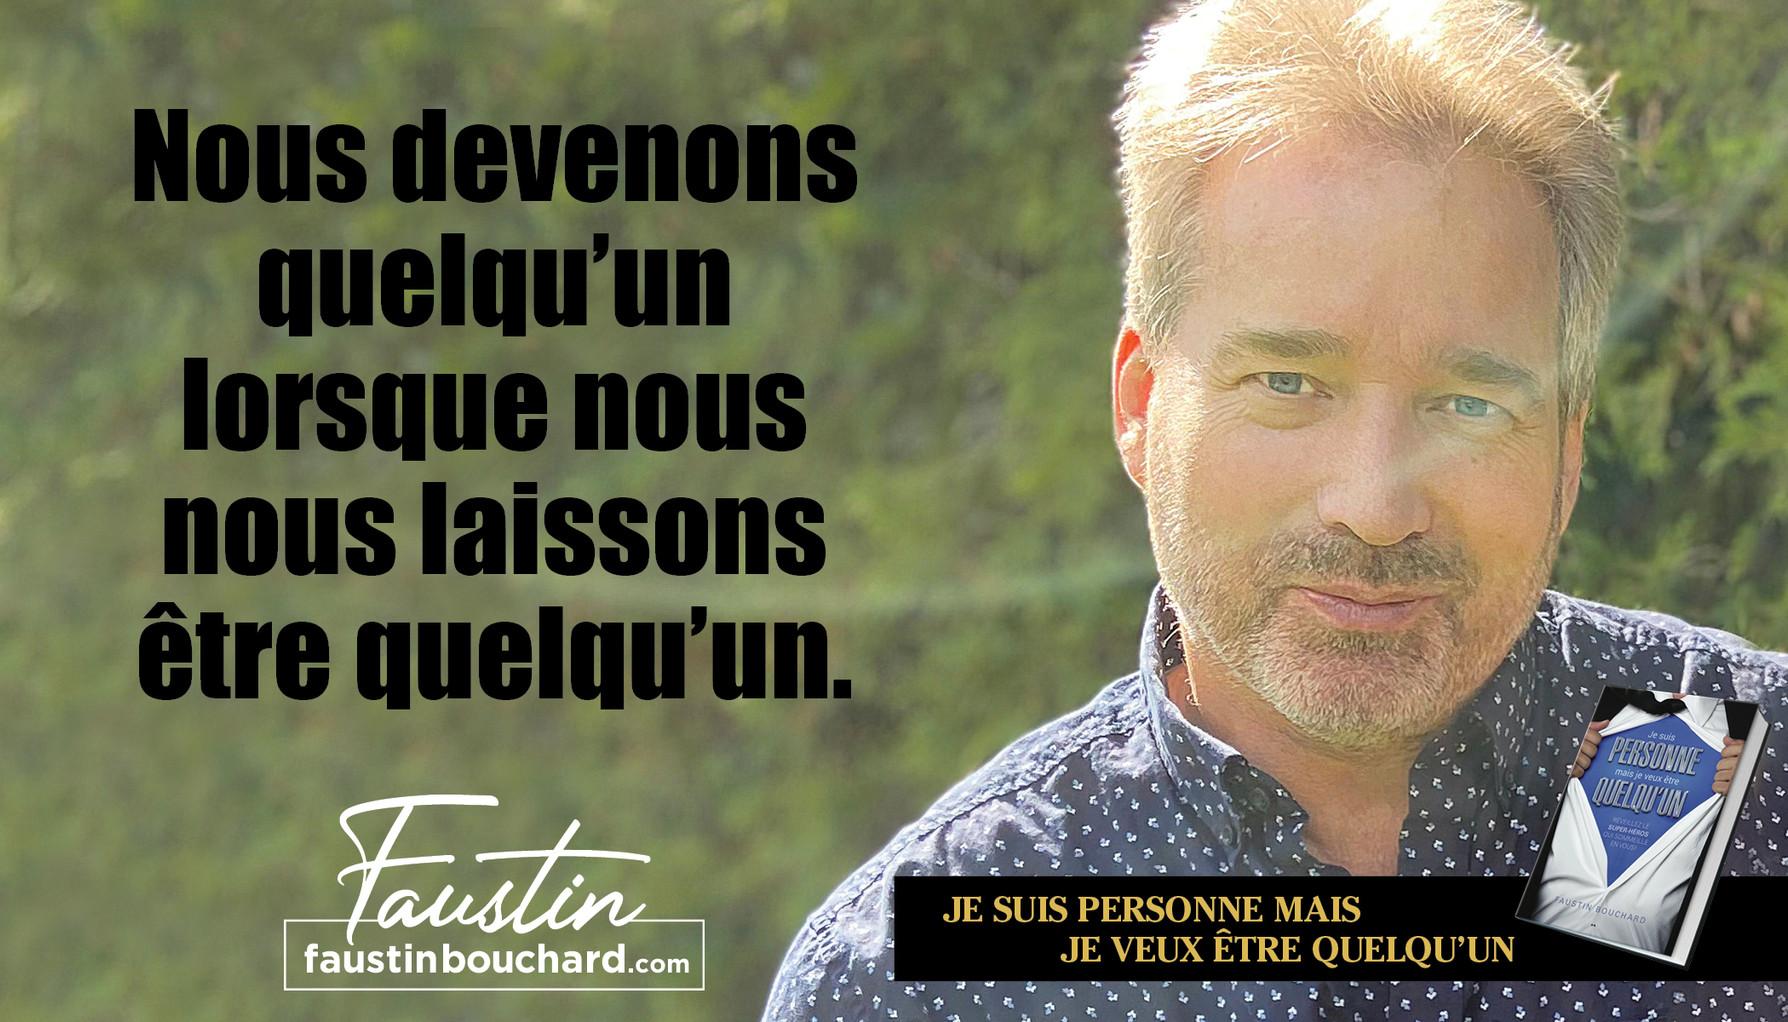 Citations_FaustinBouchard6.jpg